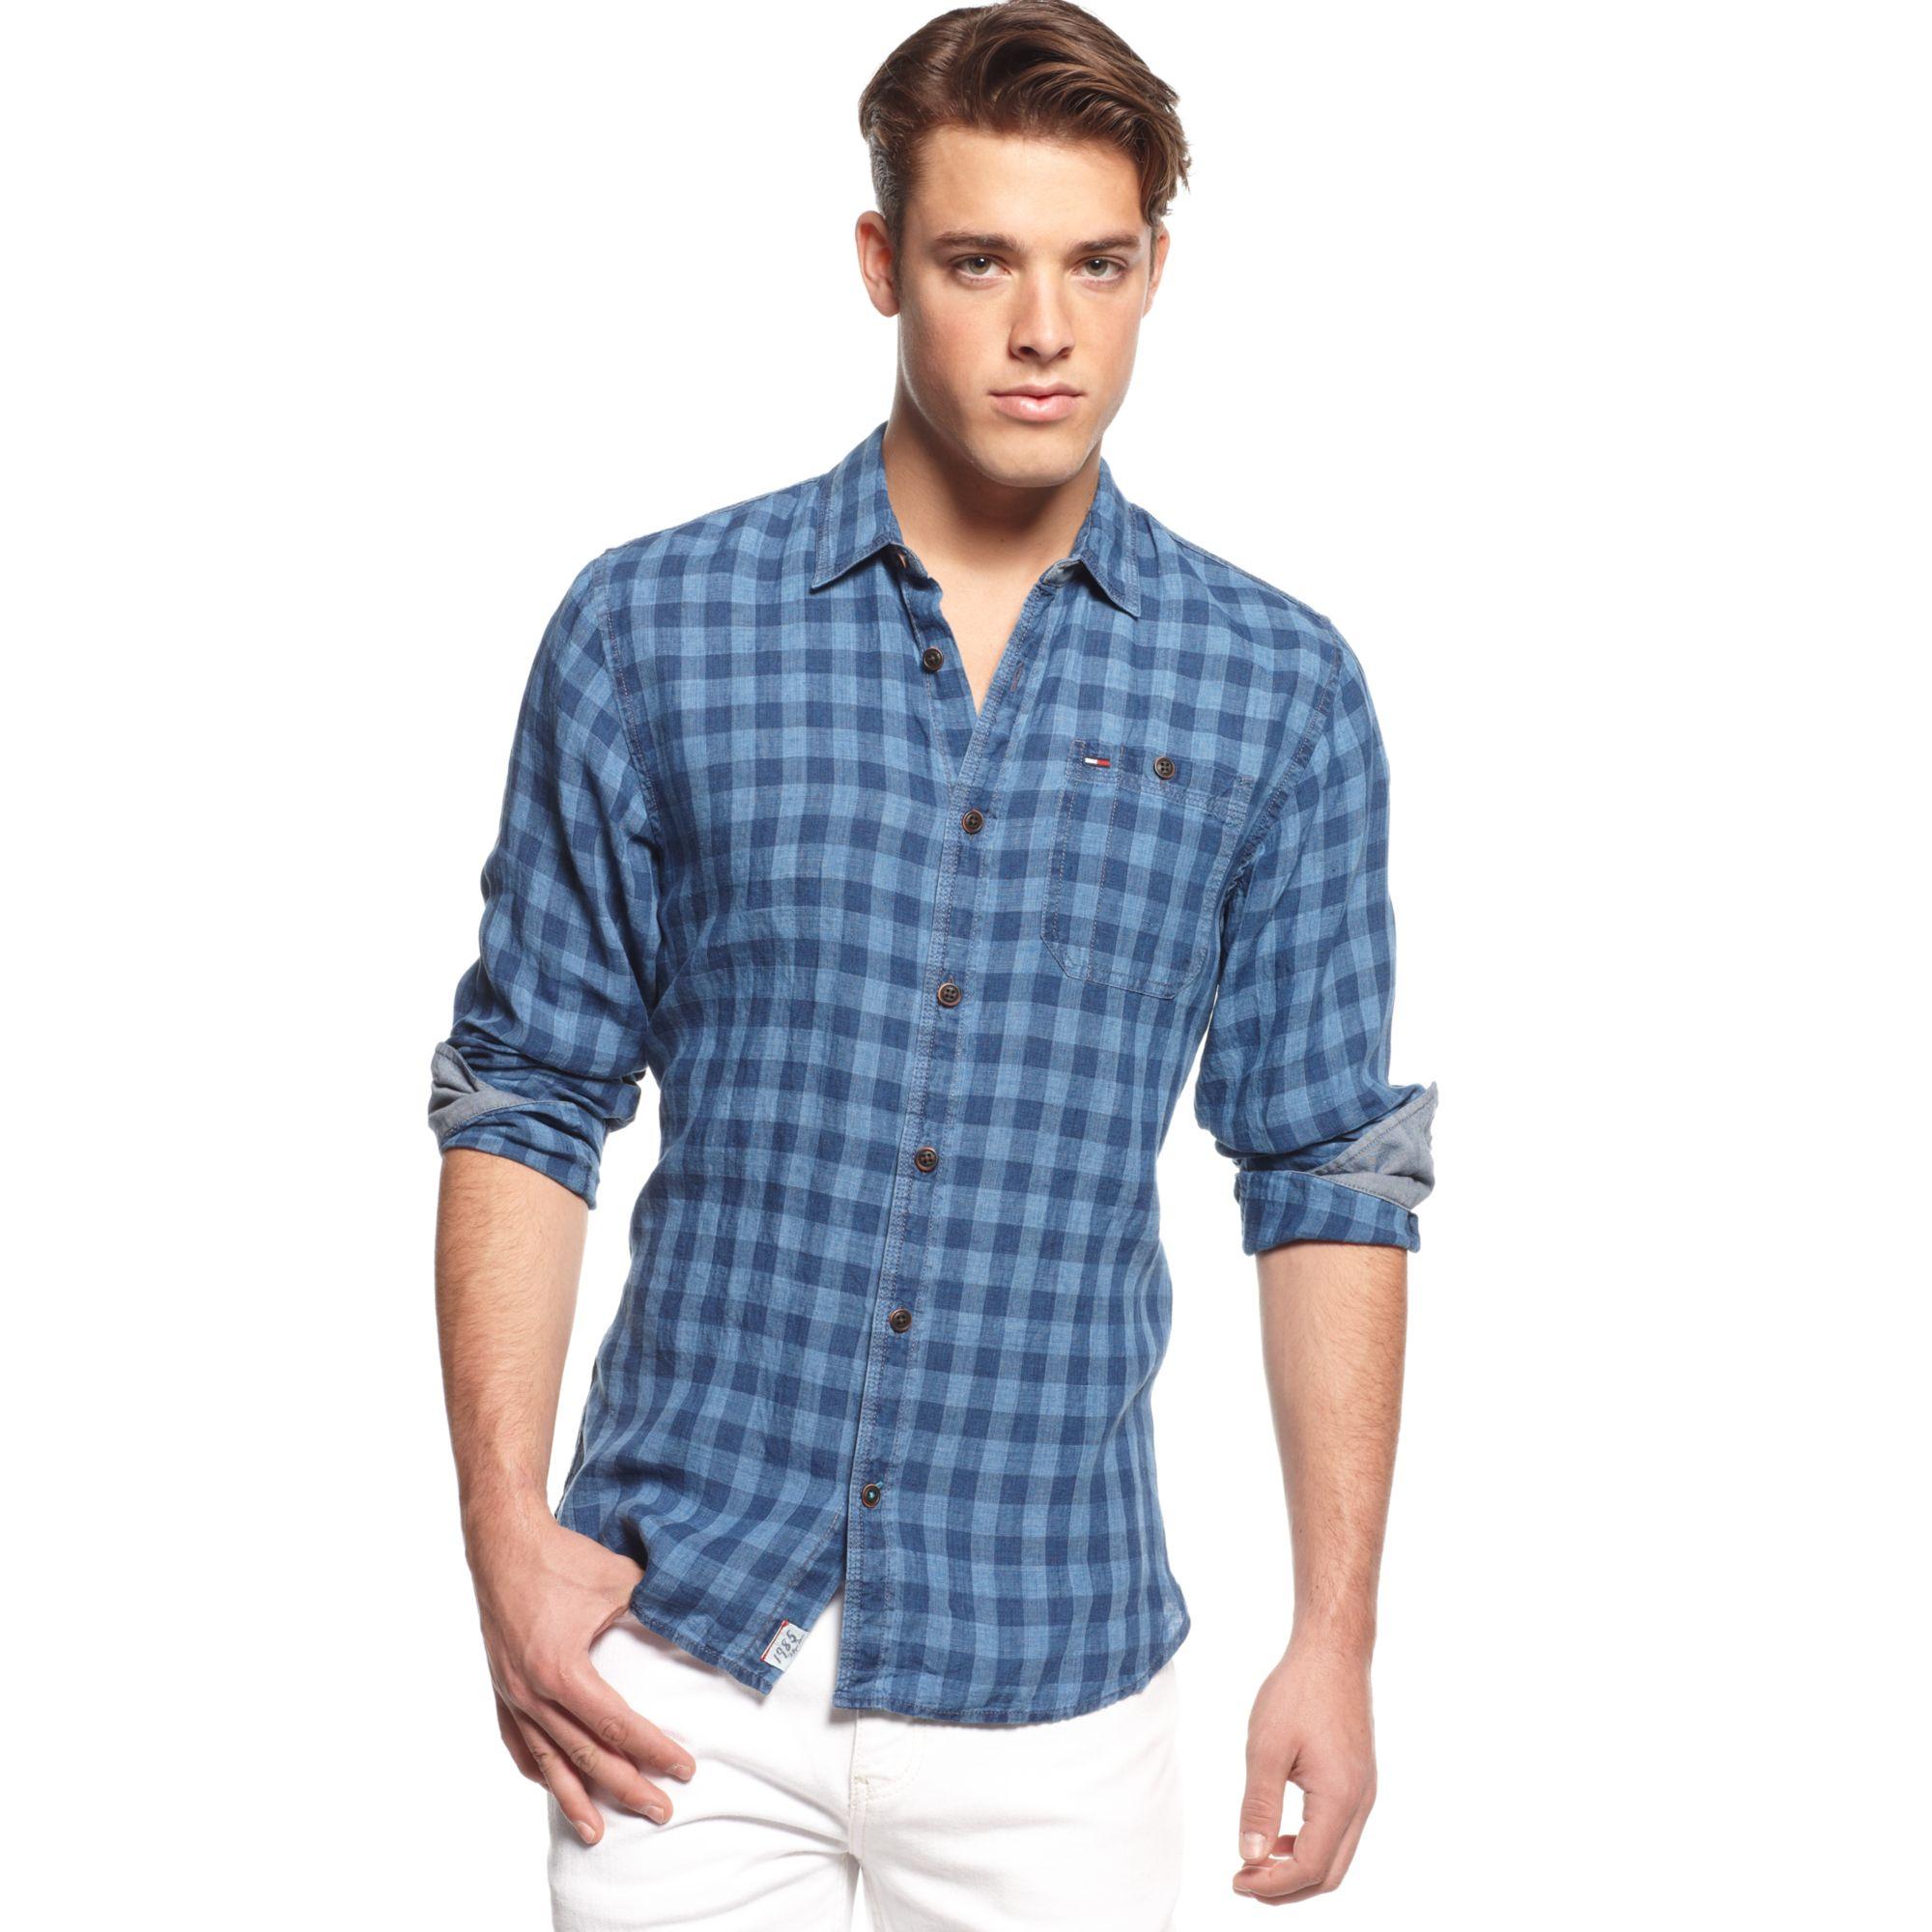 e7835fcd Tommy Hilfiger Checkered Linen Shirt Hilfiger Denim Collection in ...